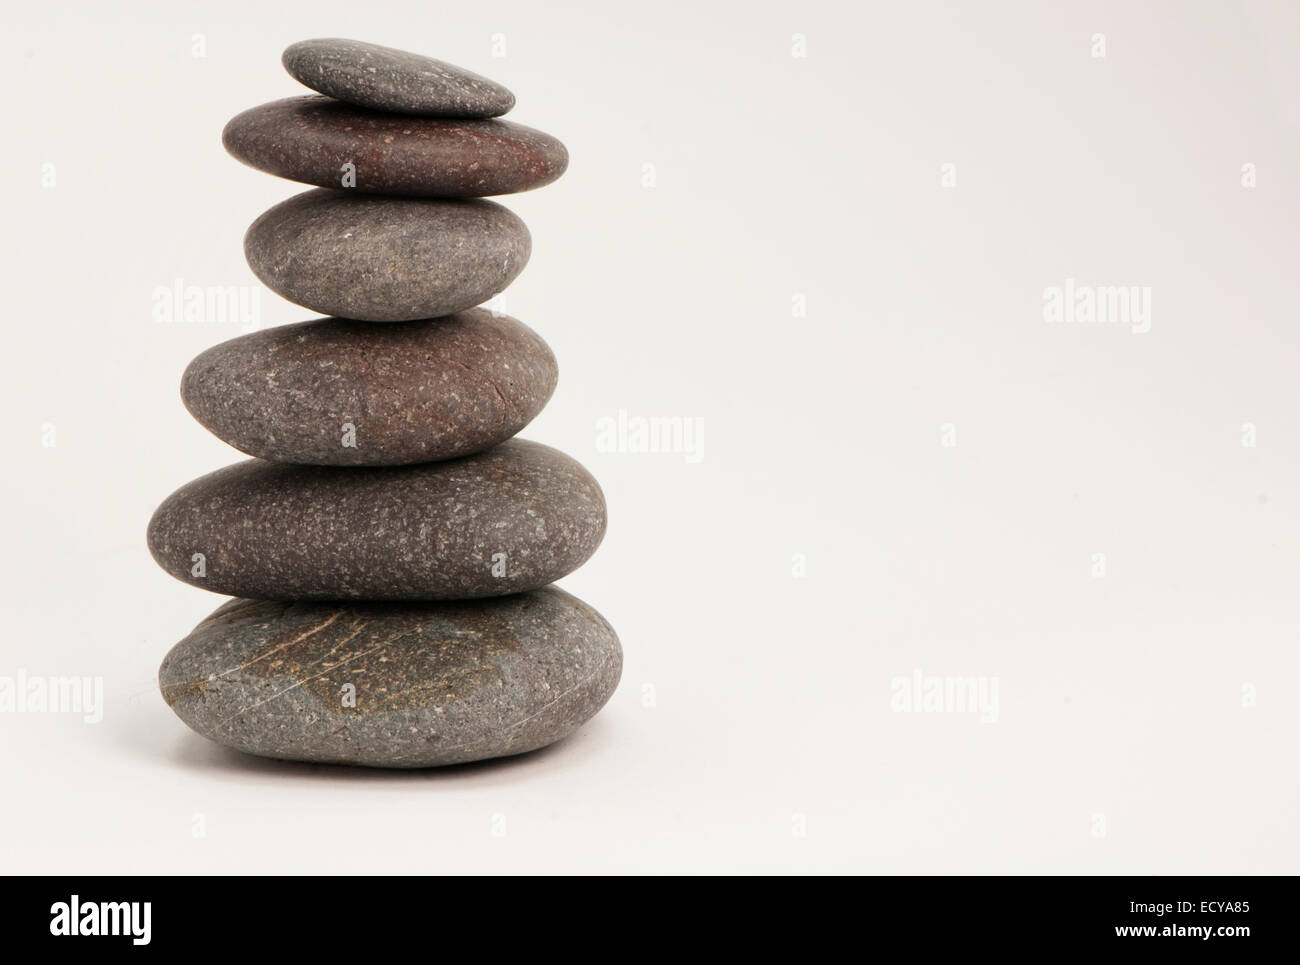 Balancing abgerundeten Kieselsteinen. Stockfoto